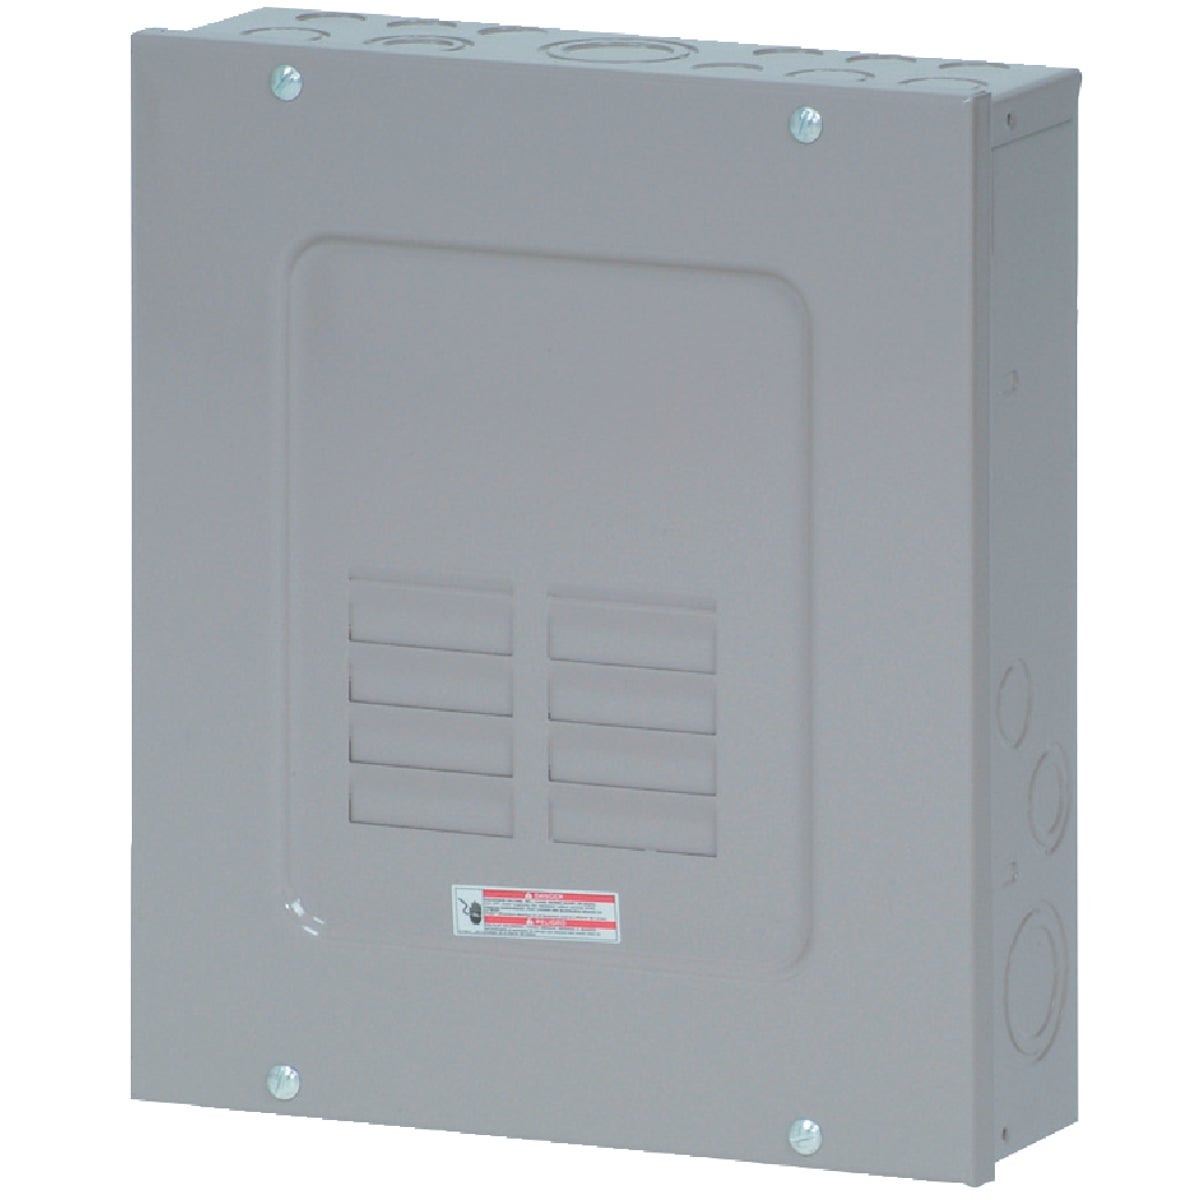 MAIN LUG LOAD CENTER - CH8L125SP by Eaton Corporation